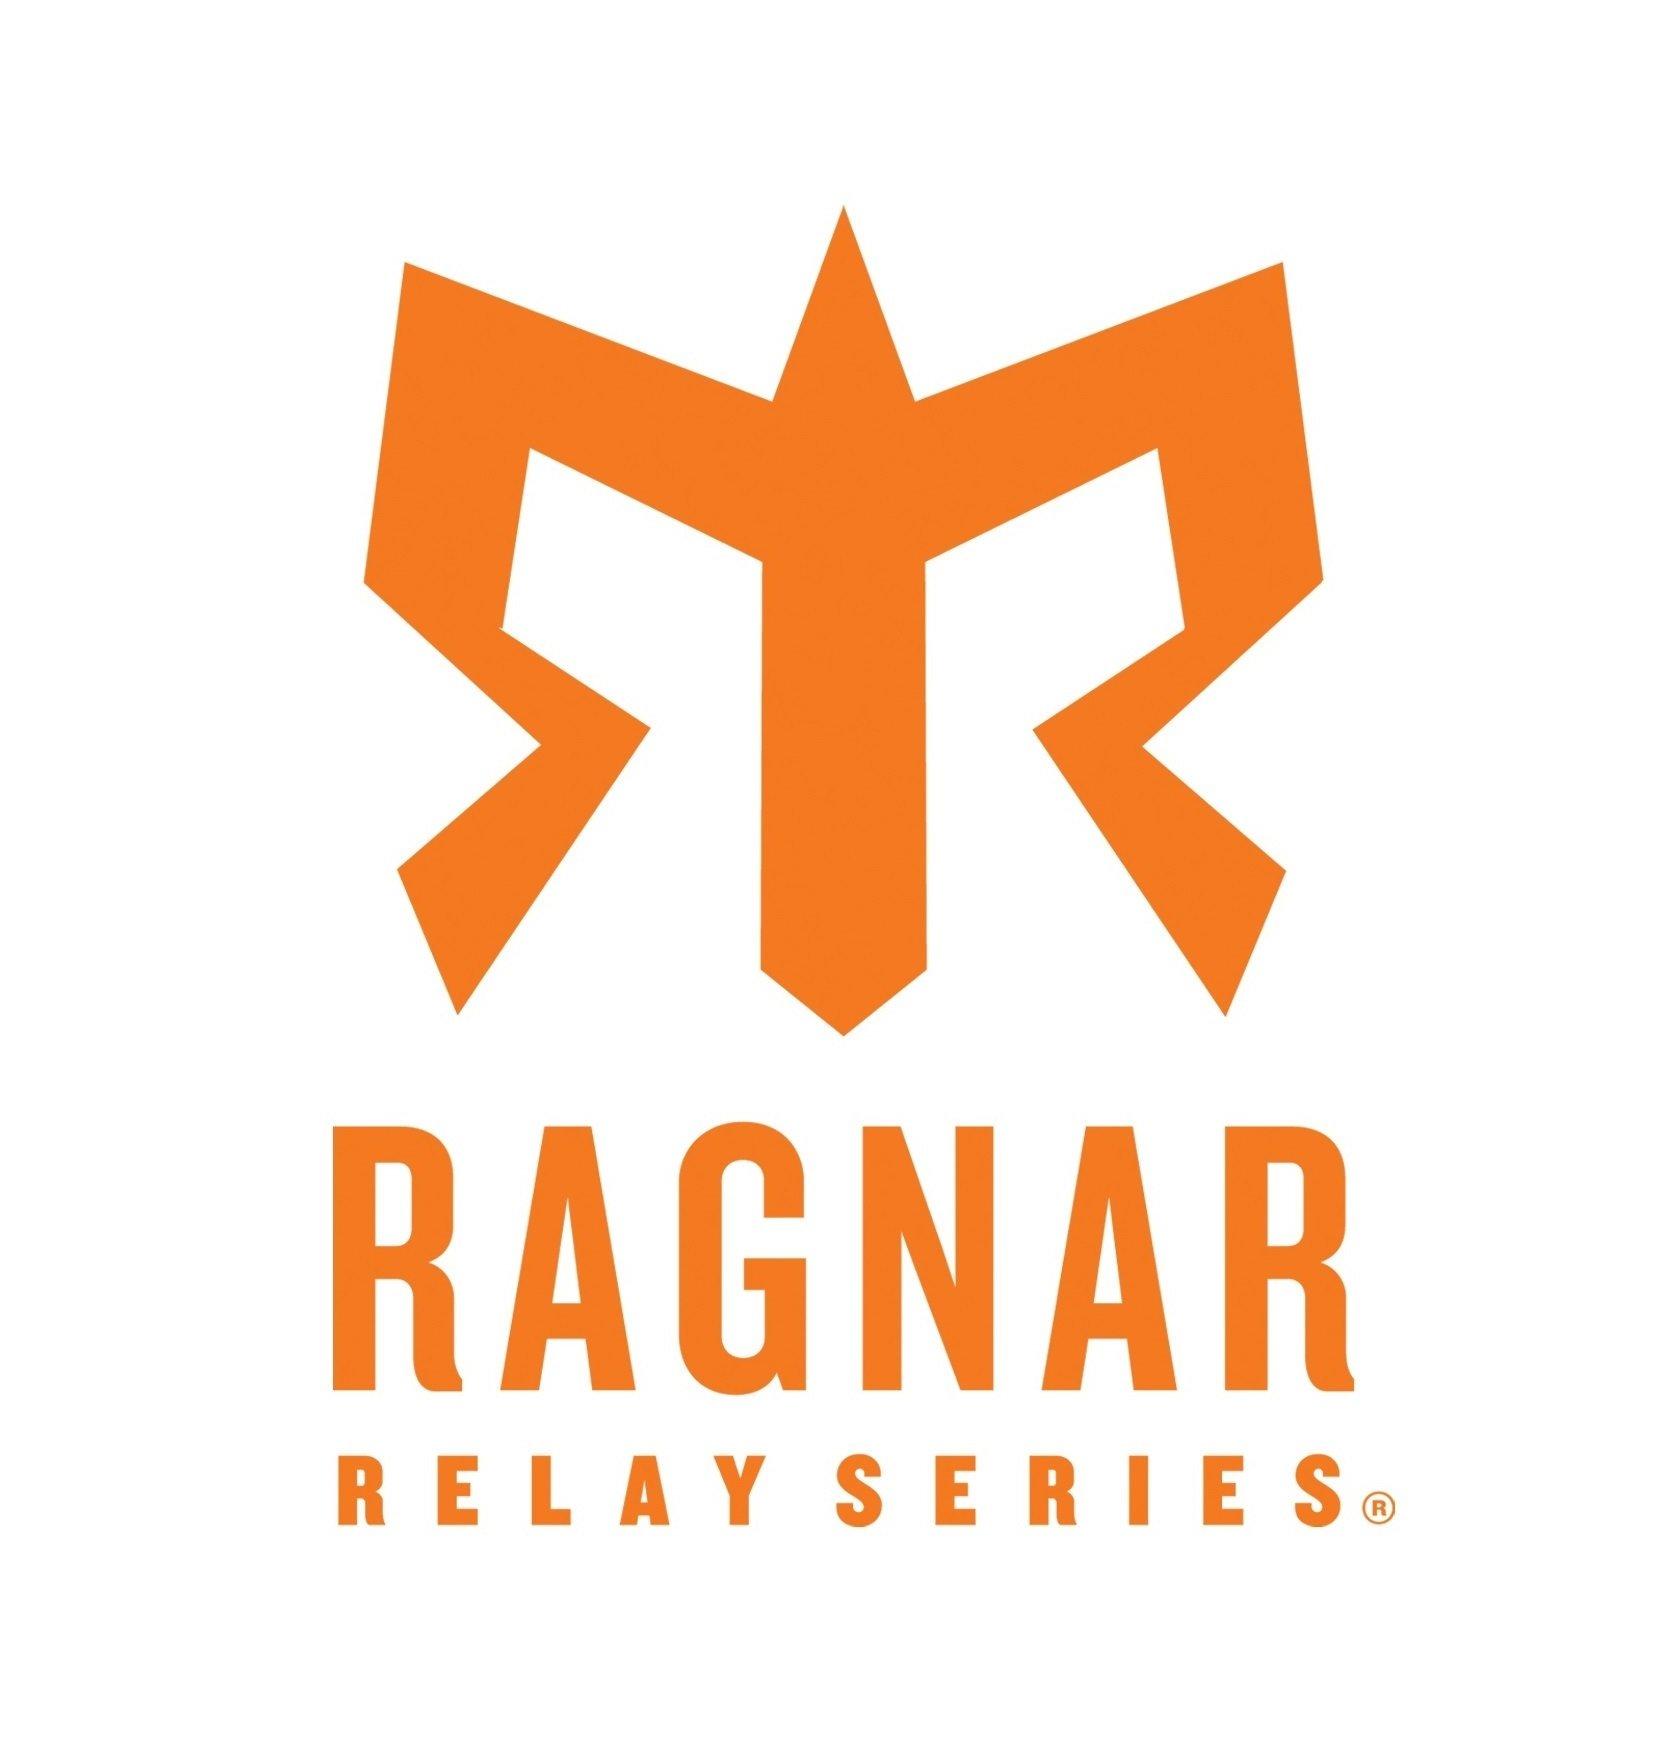 RagnarRelay0_076cbed0-5056-a36a-0860fd85b6e9f306.jpg